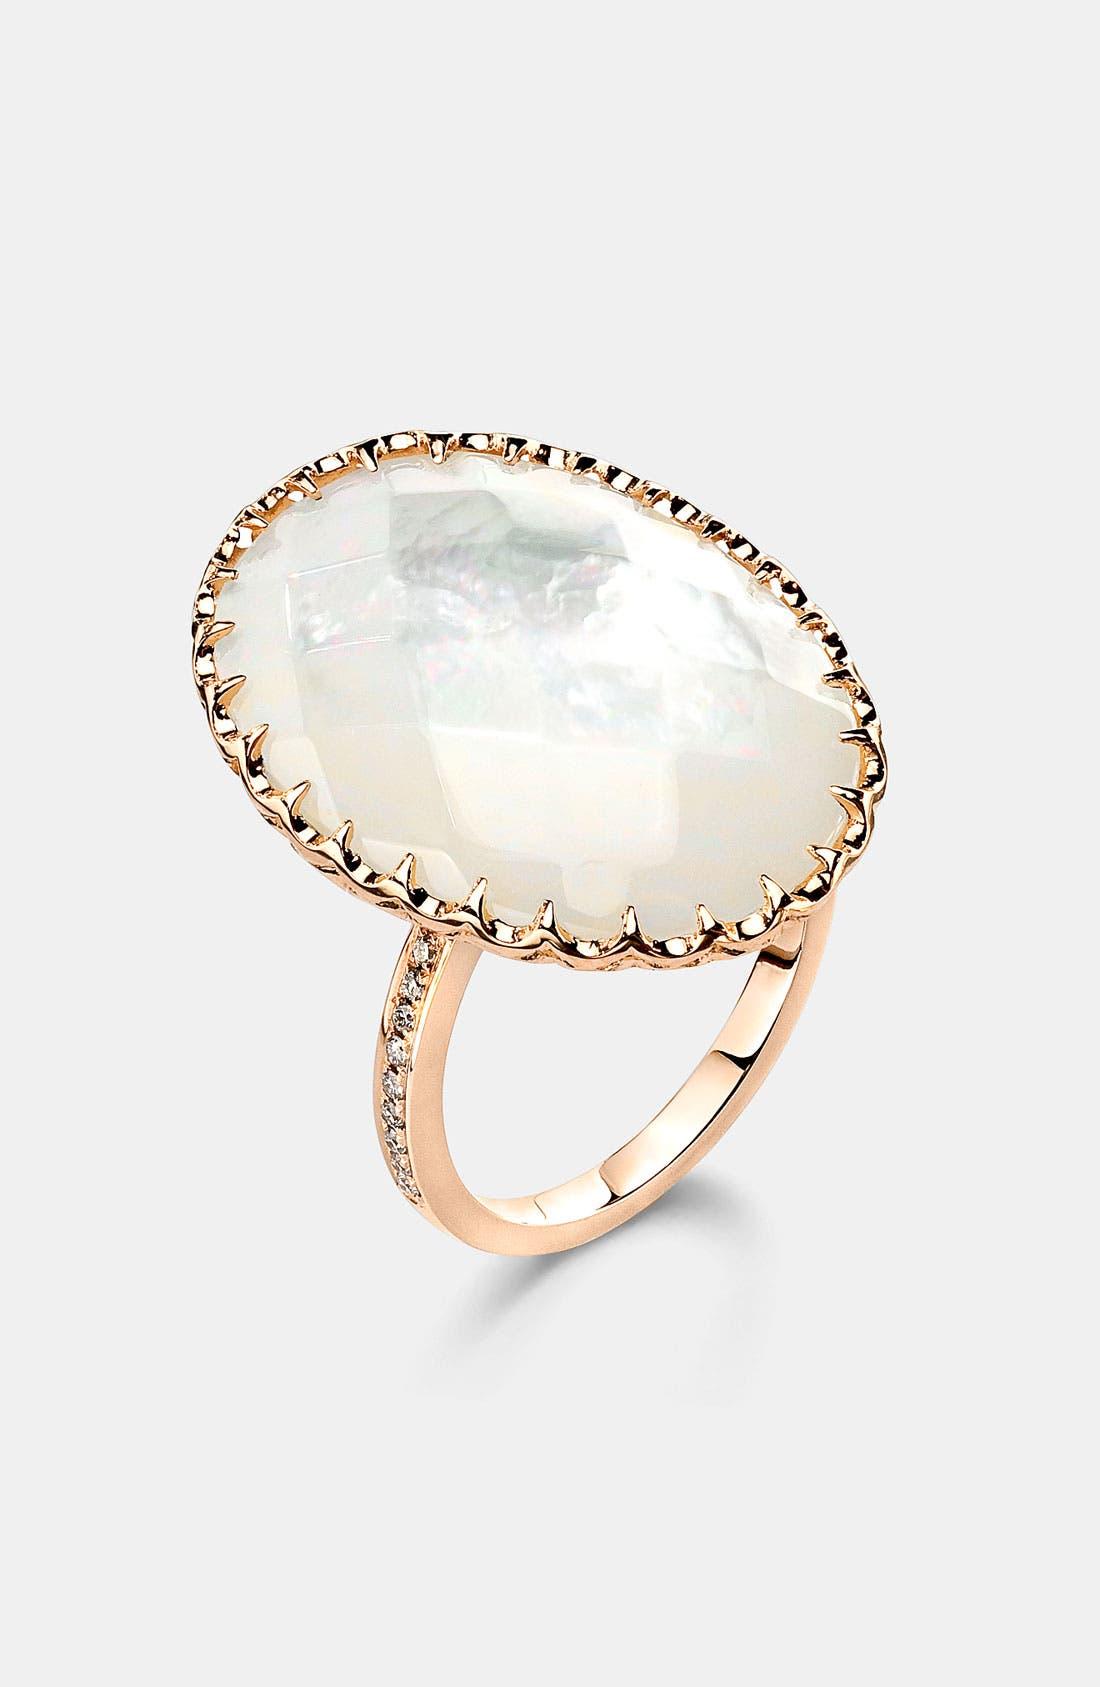 Main Image - Ivanka Trump Oval Stone Cocktail Ring